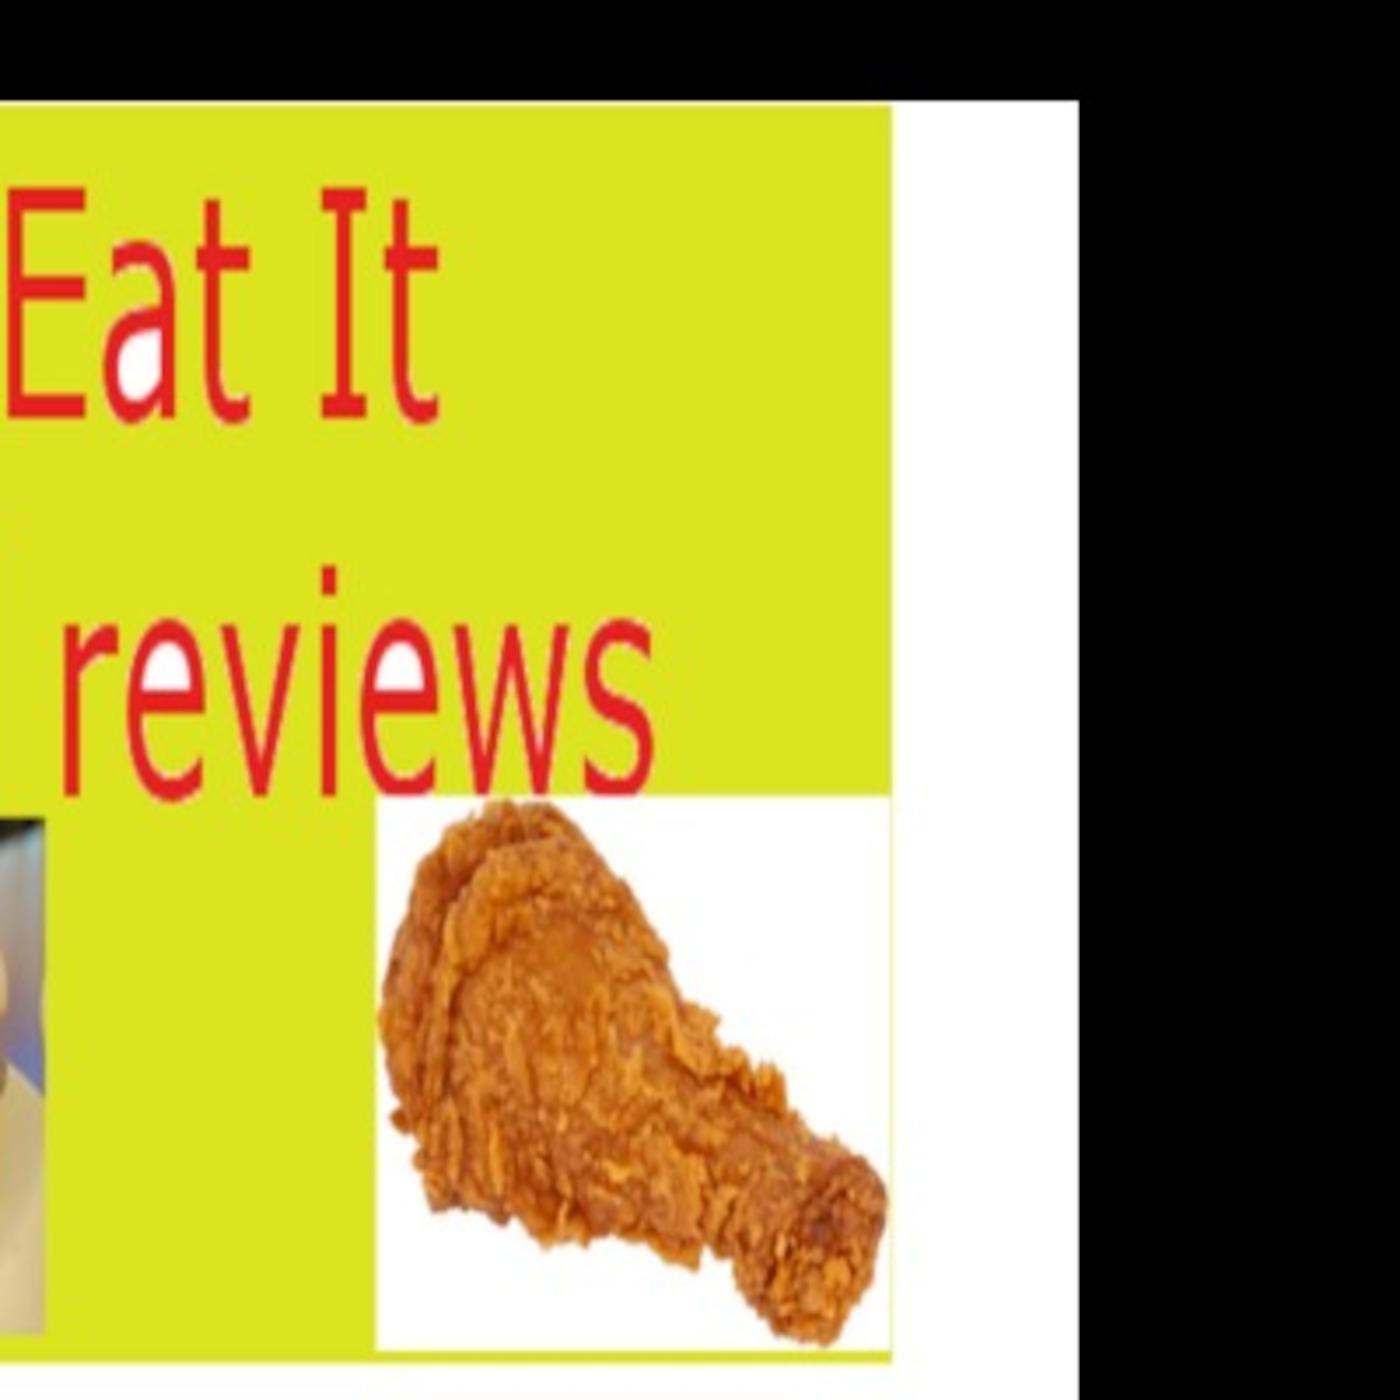 Just Eat (food reviews)